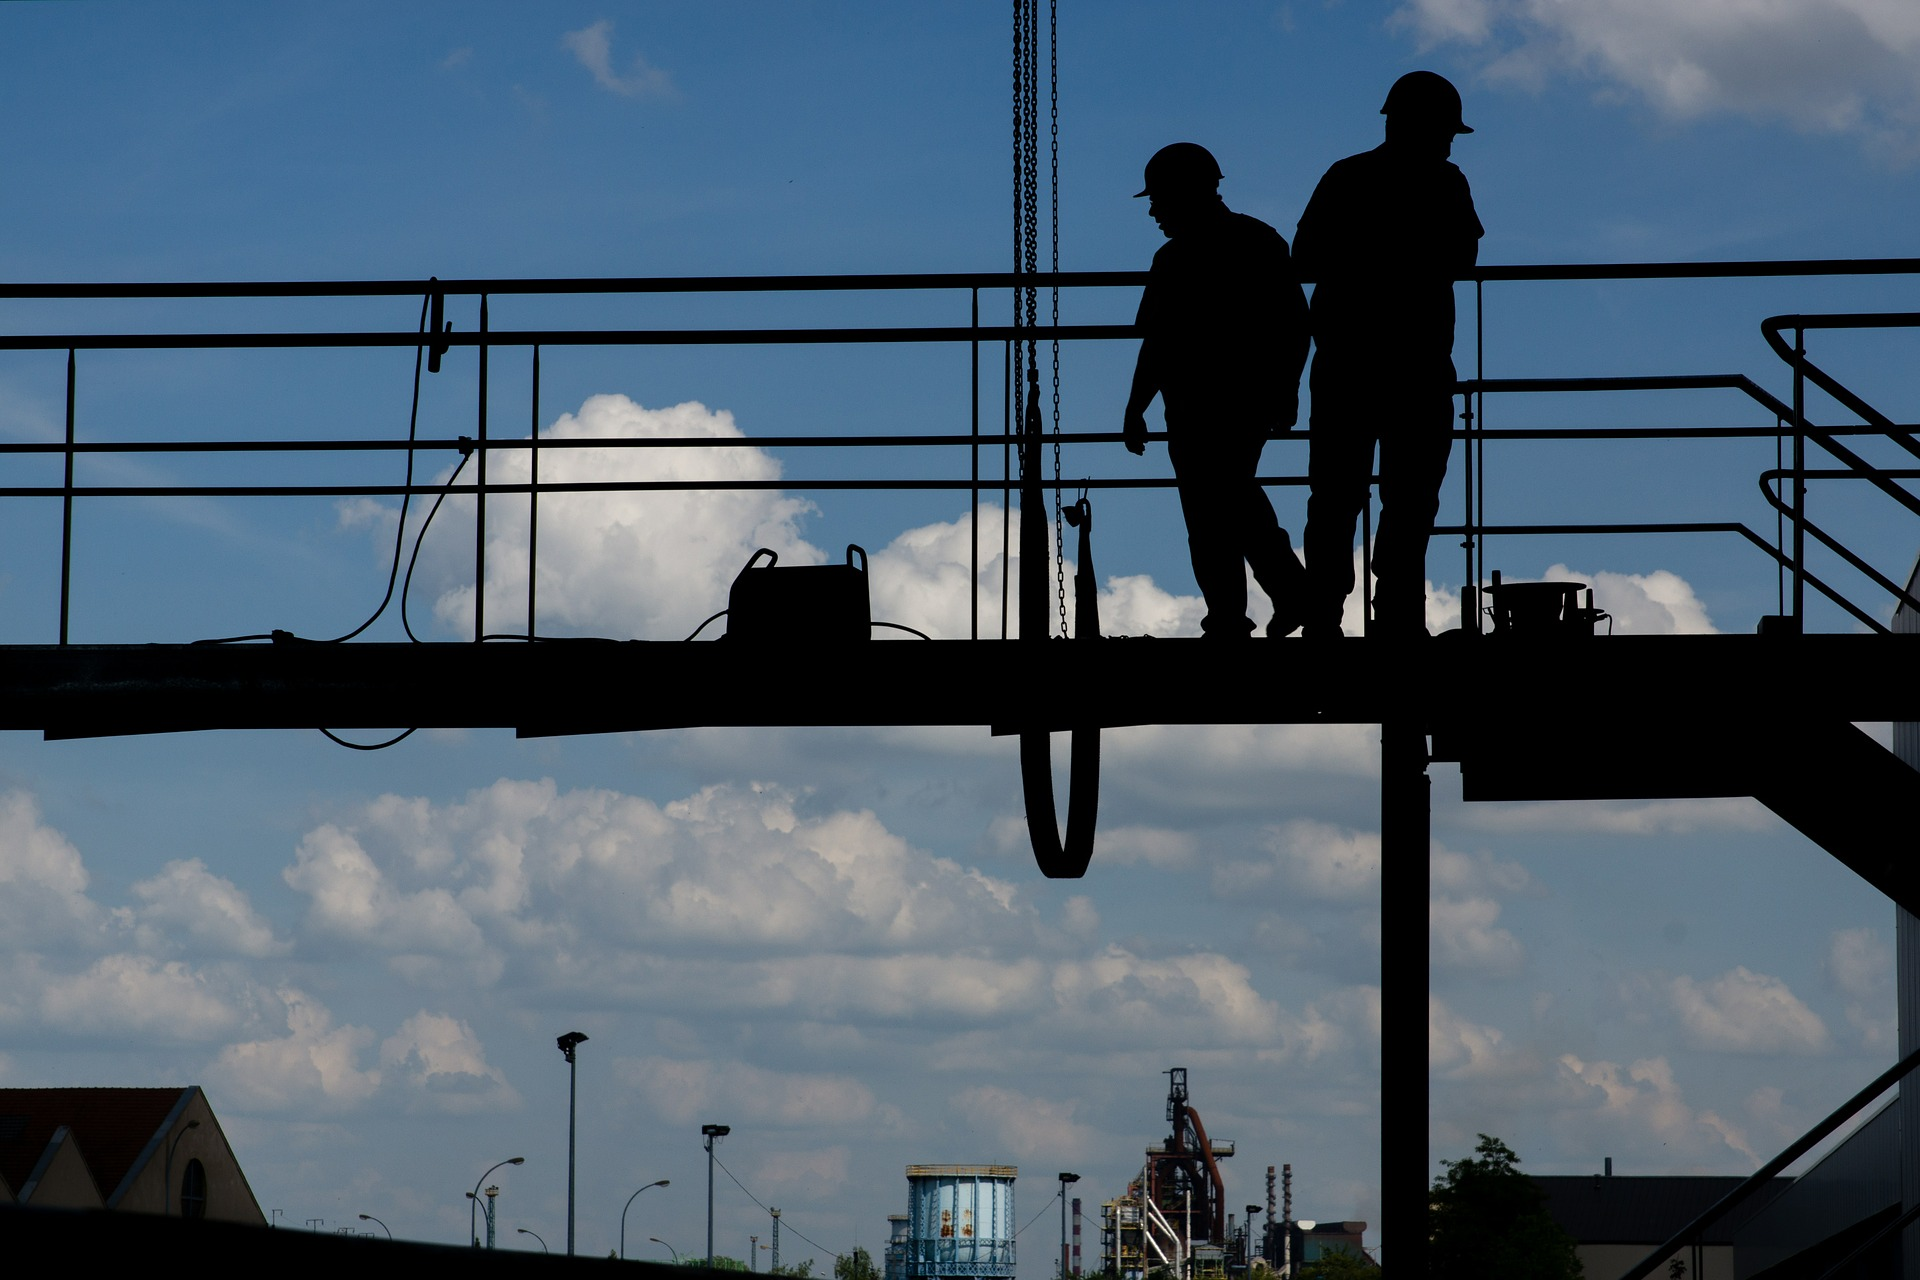 Правила по охране труда при работе на высоте.